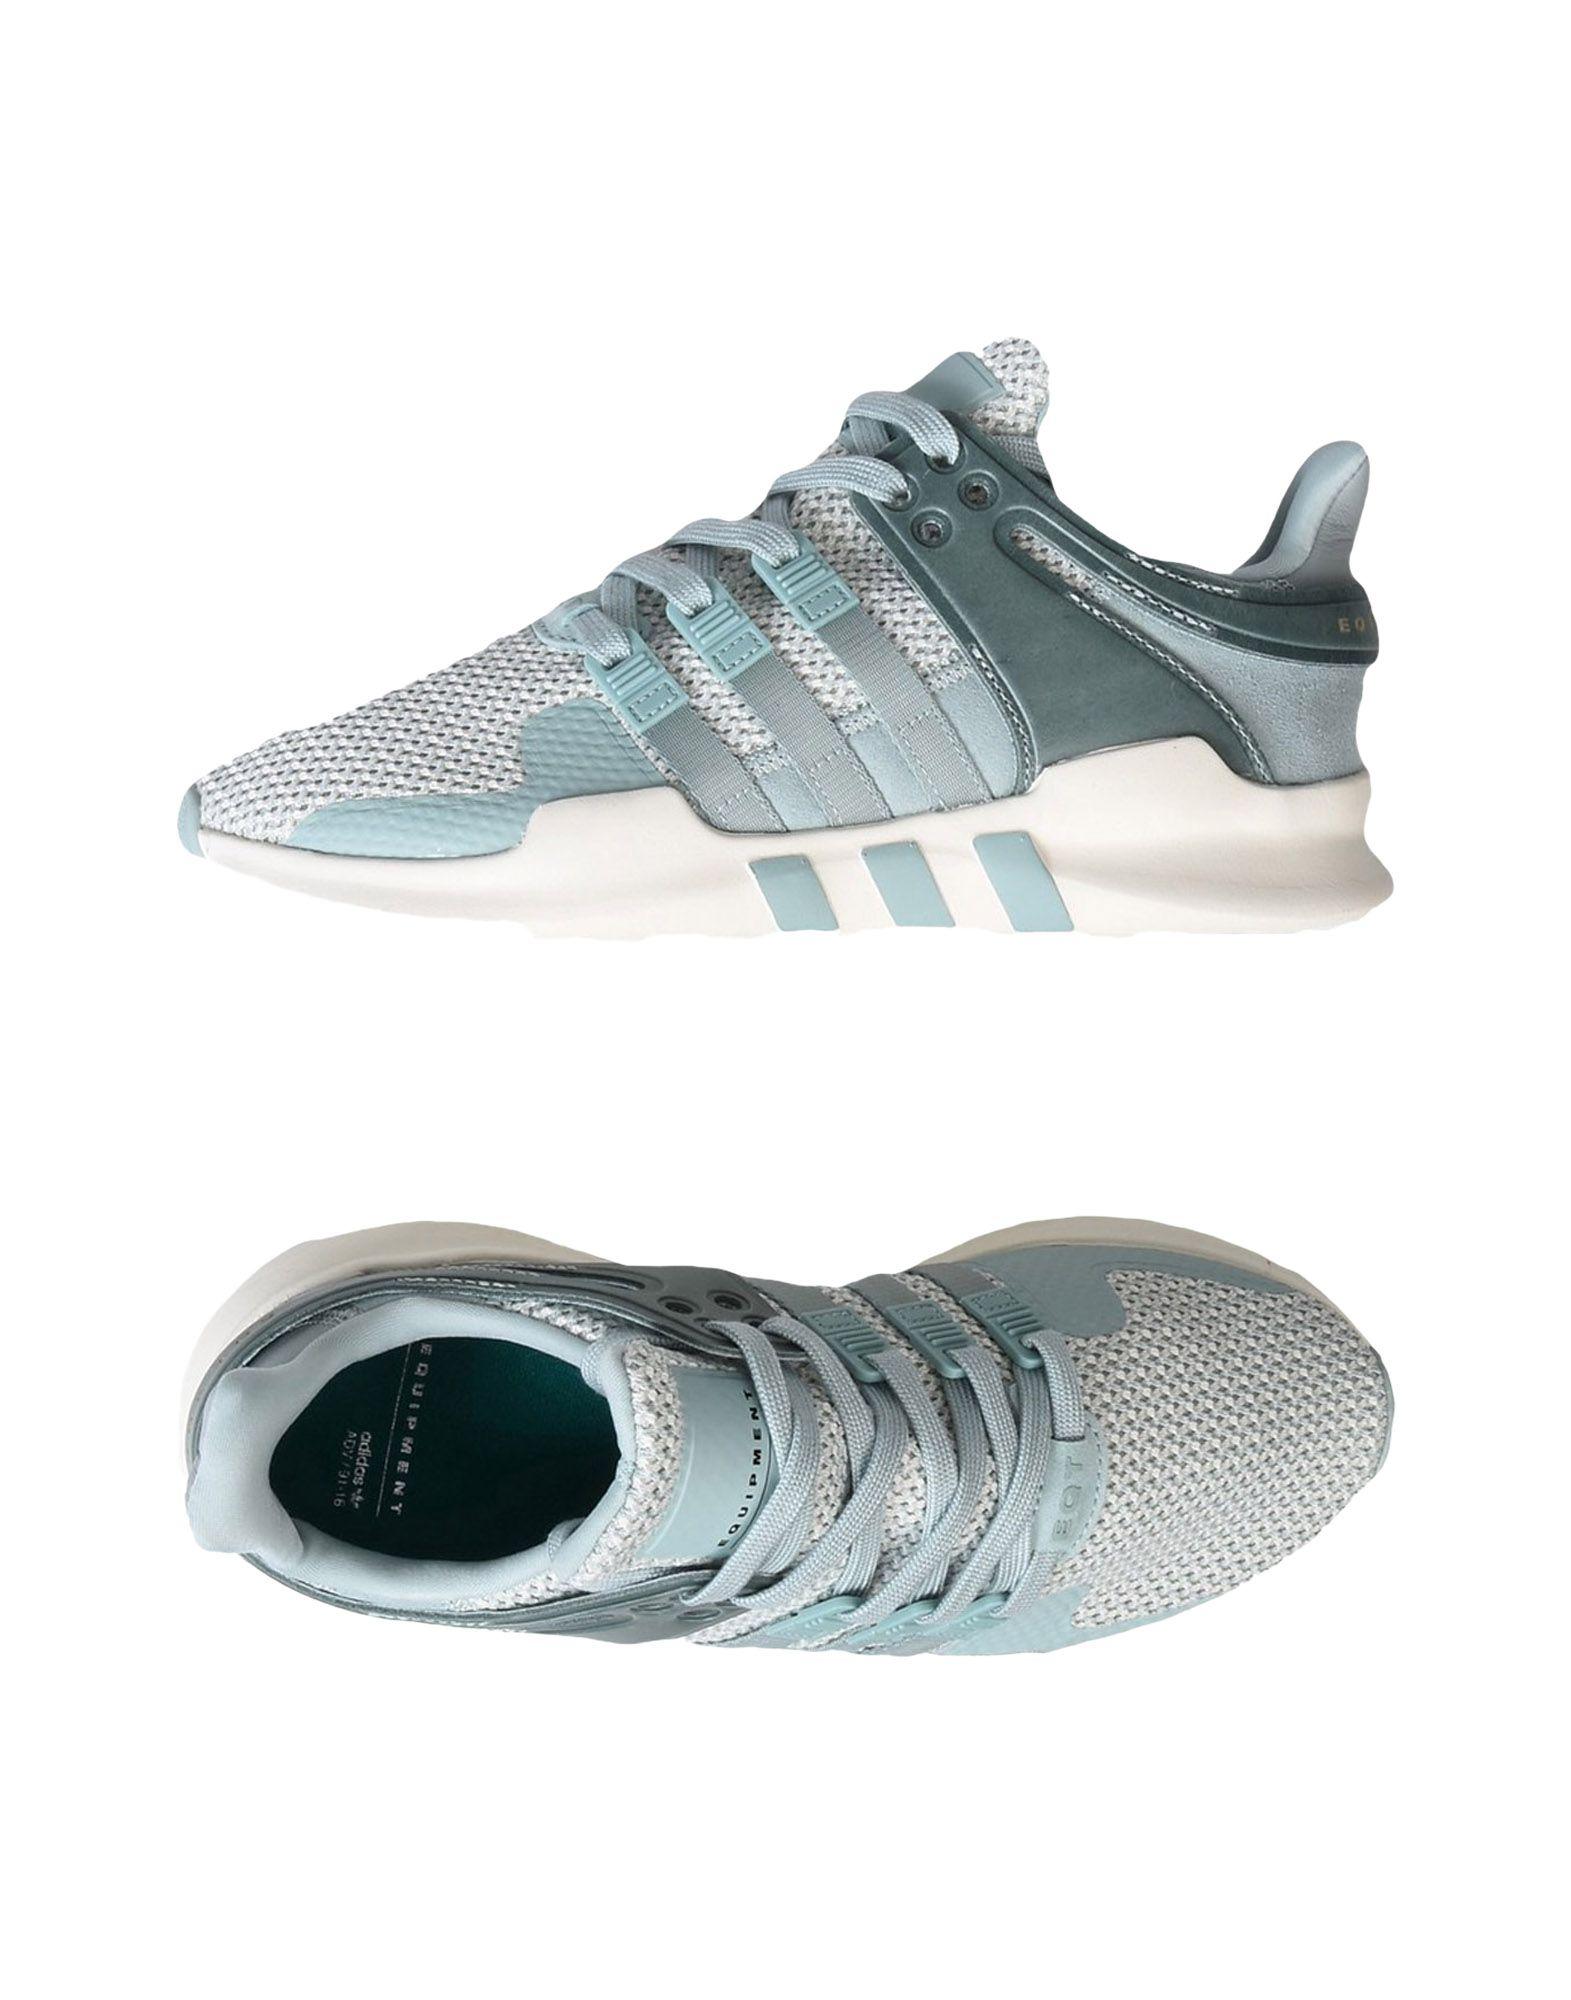 Adidas Originals Equipment Support A - Sneakers - Women on Adidas Originals Sneakers online on Women  United Kingdom - 11265509LD 56416f